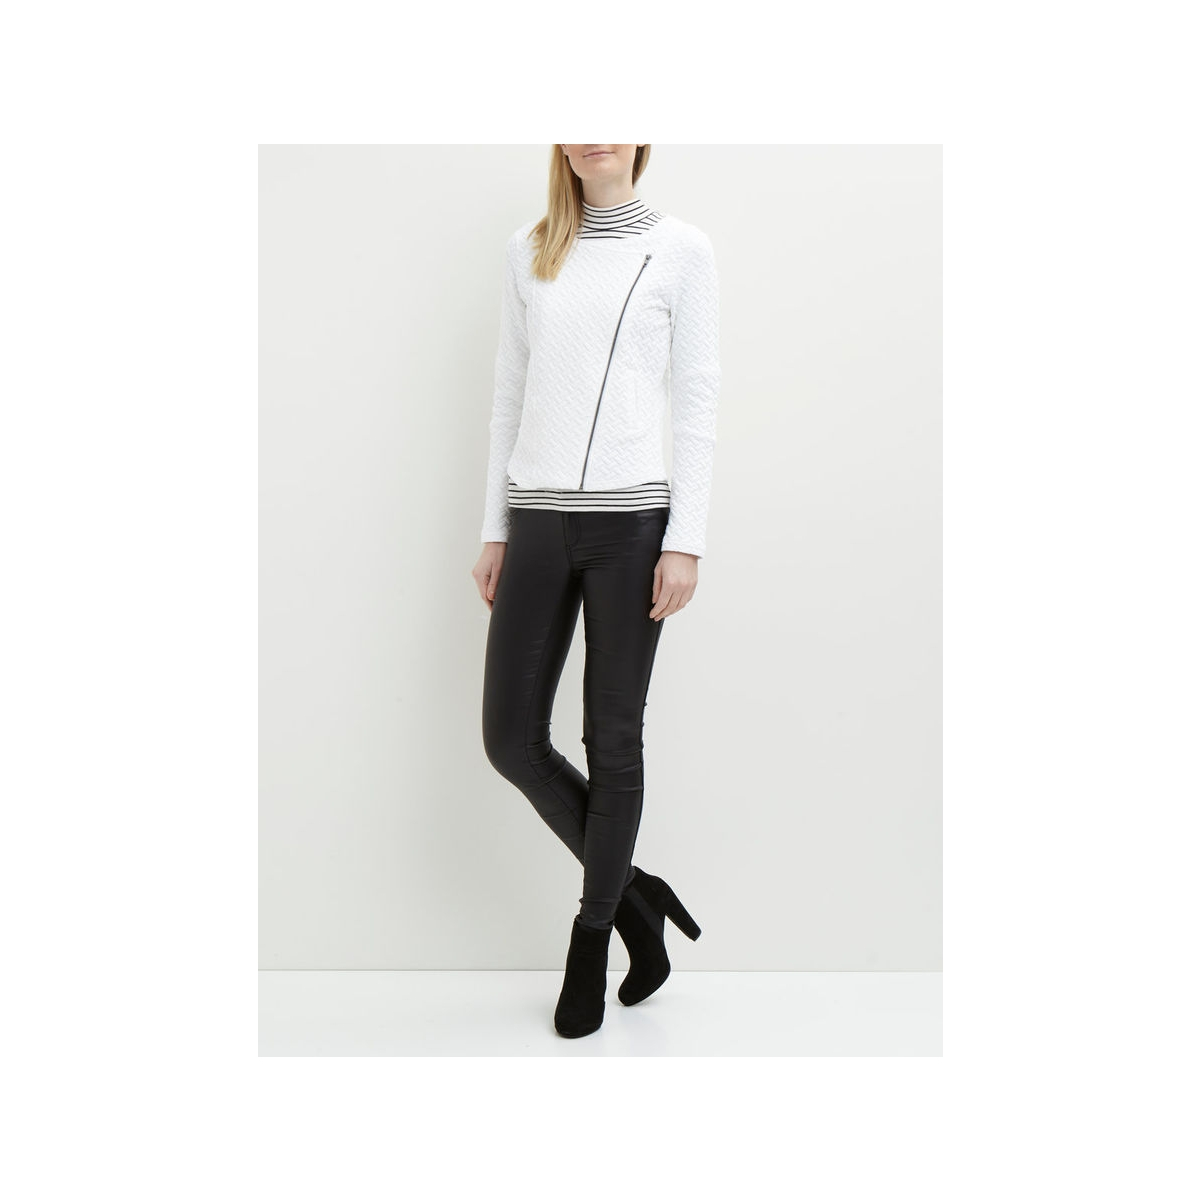 objcamden courtney l/s blazer noos 23023817 object vest white